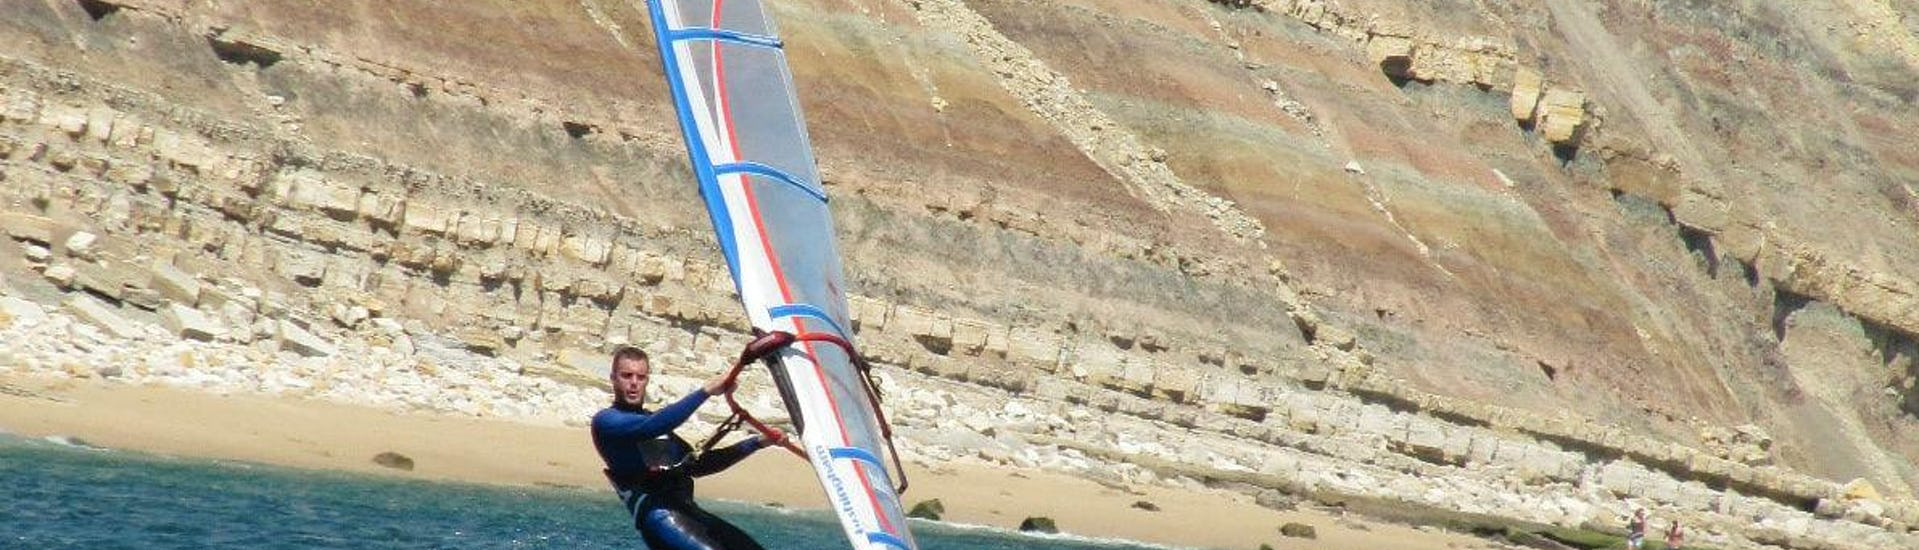 Windsurfing Lessons Advanced - Praia da Luz